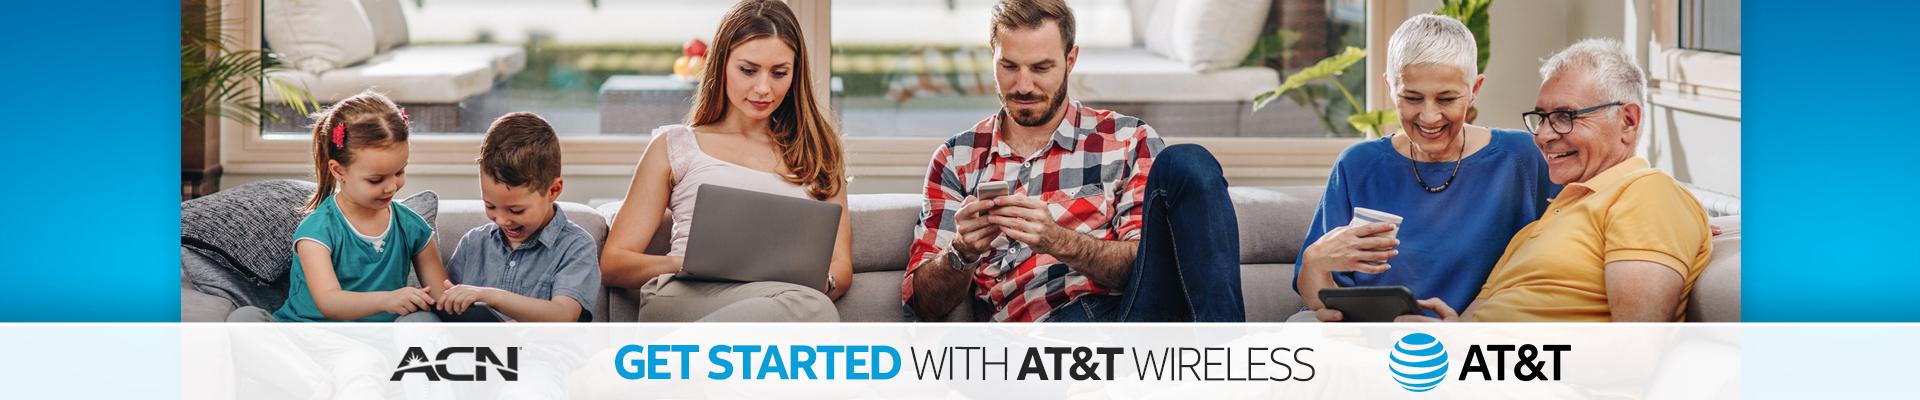 ATT-Wireless_Get_Started_Web